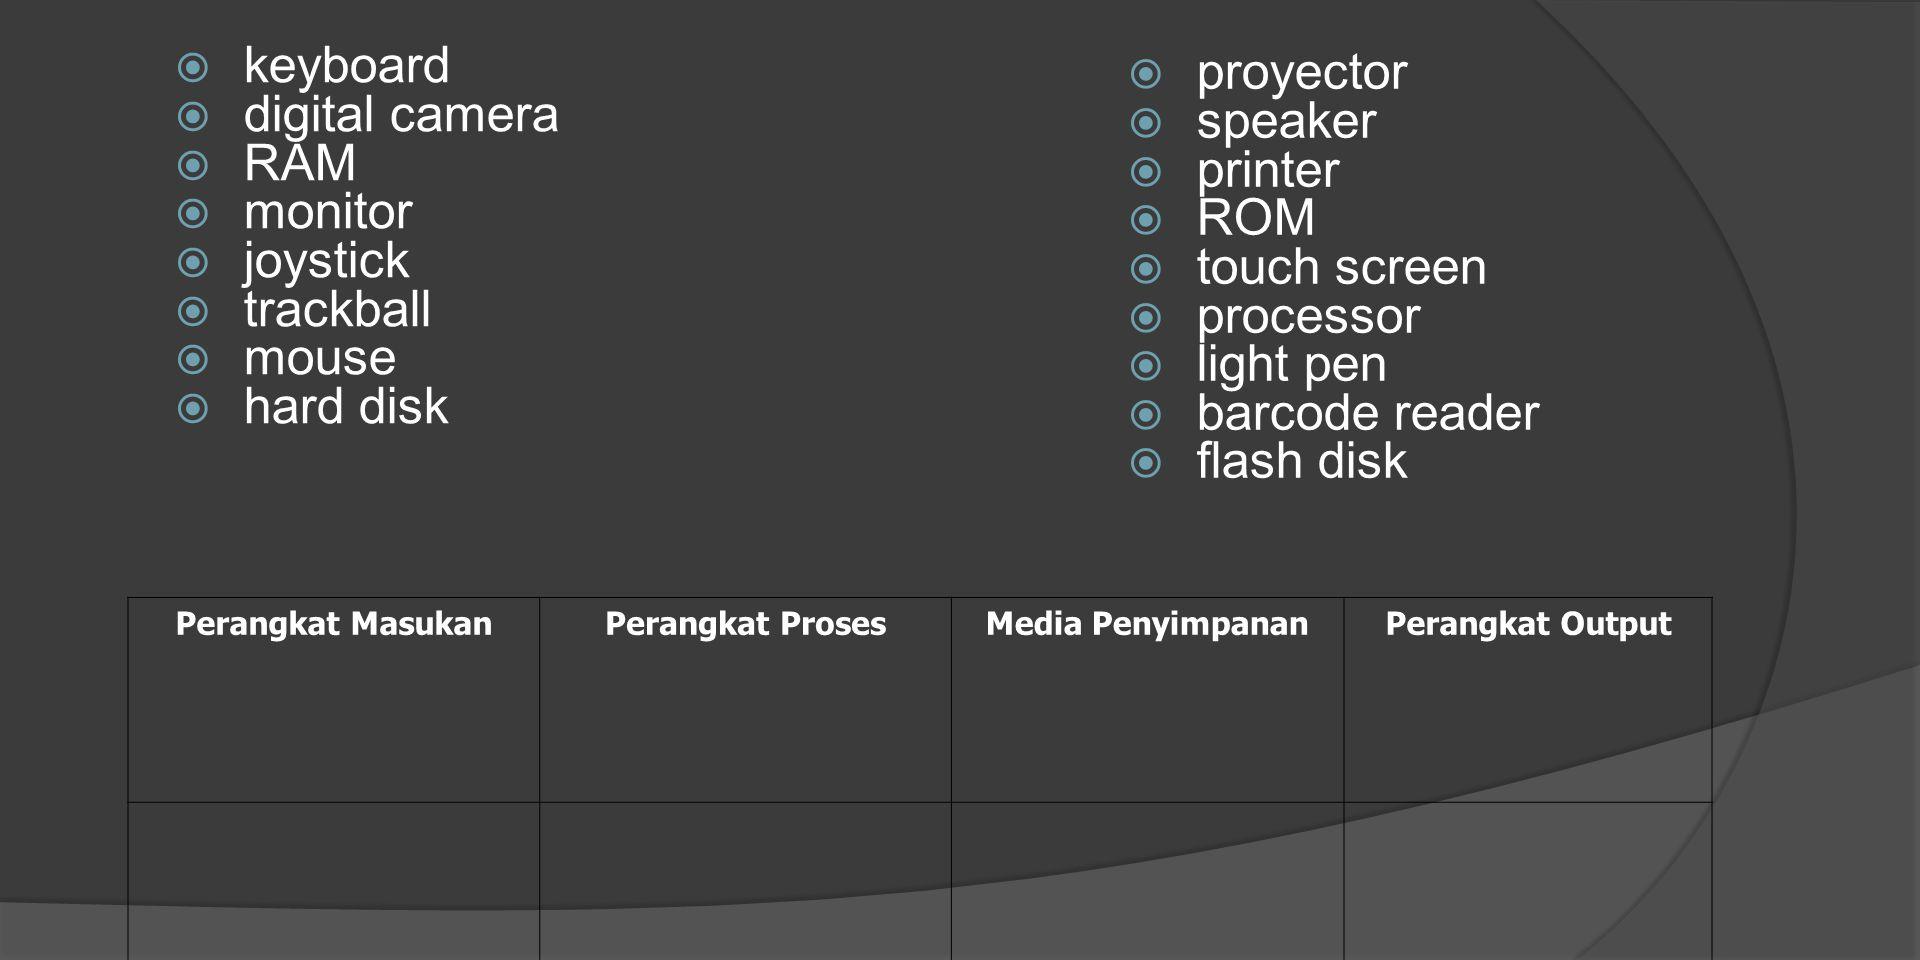  keyboard  digital camera  RAM  monitor  joystick  trackball  mouse  hard disk  proyector  speaker  printer  ROM  touch screen  processo